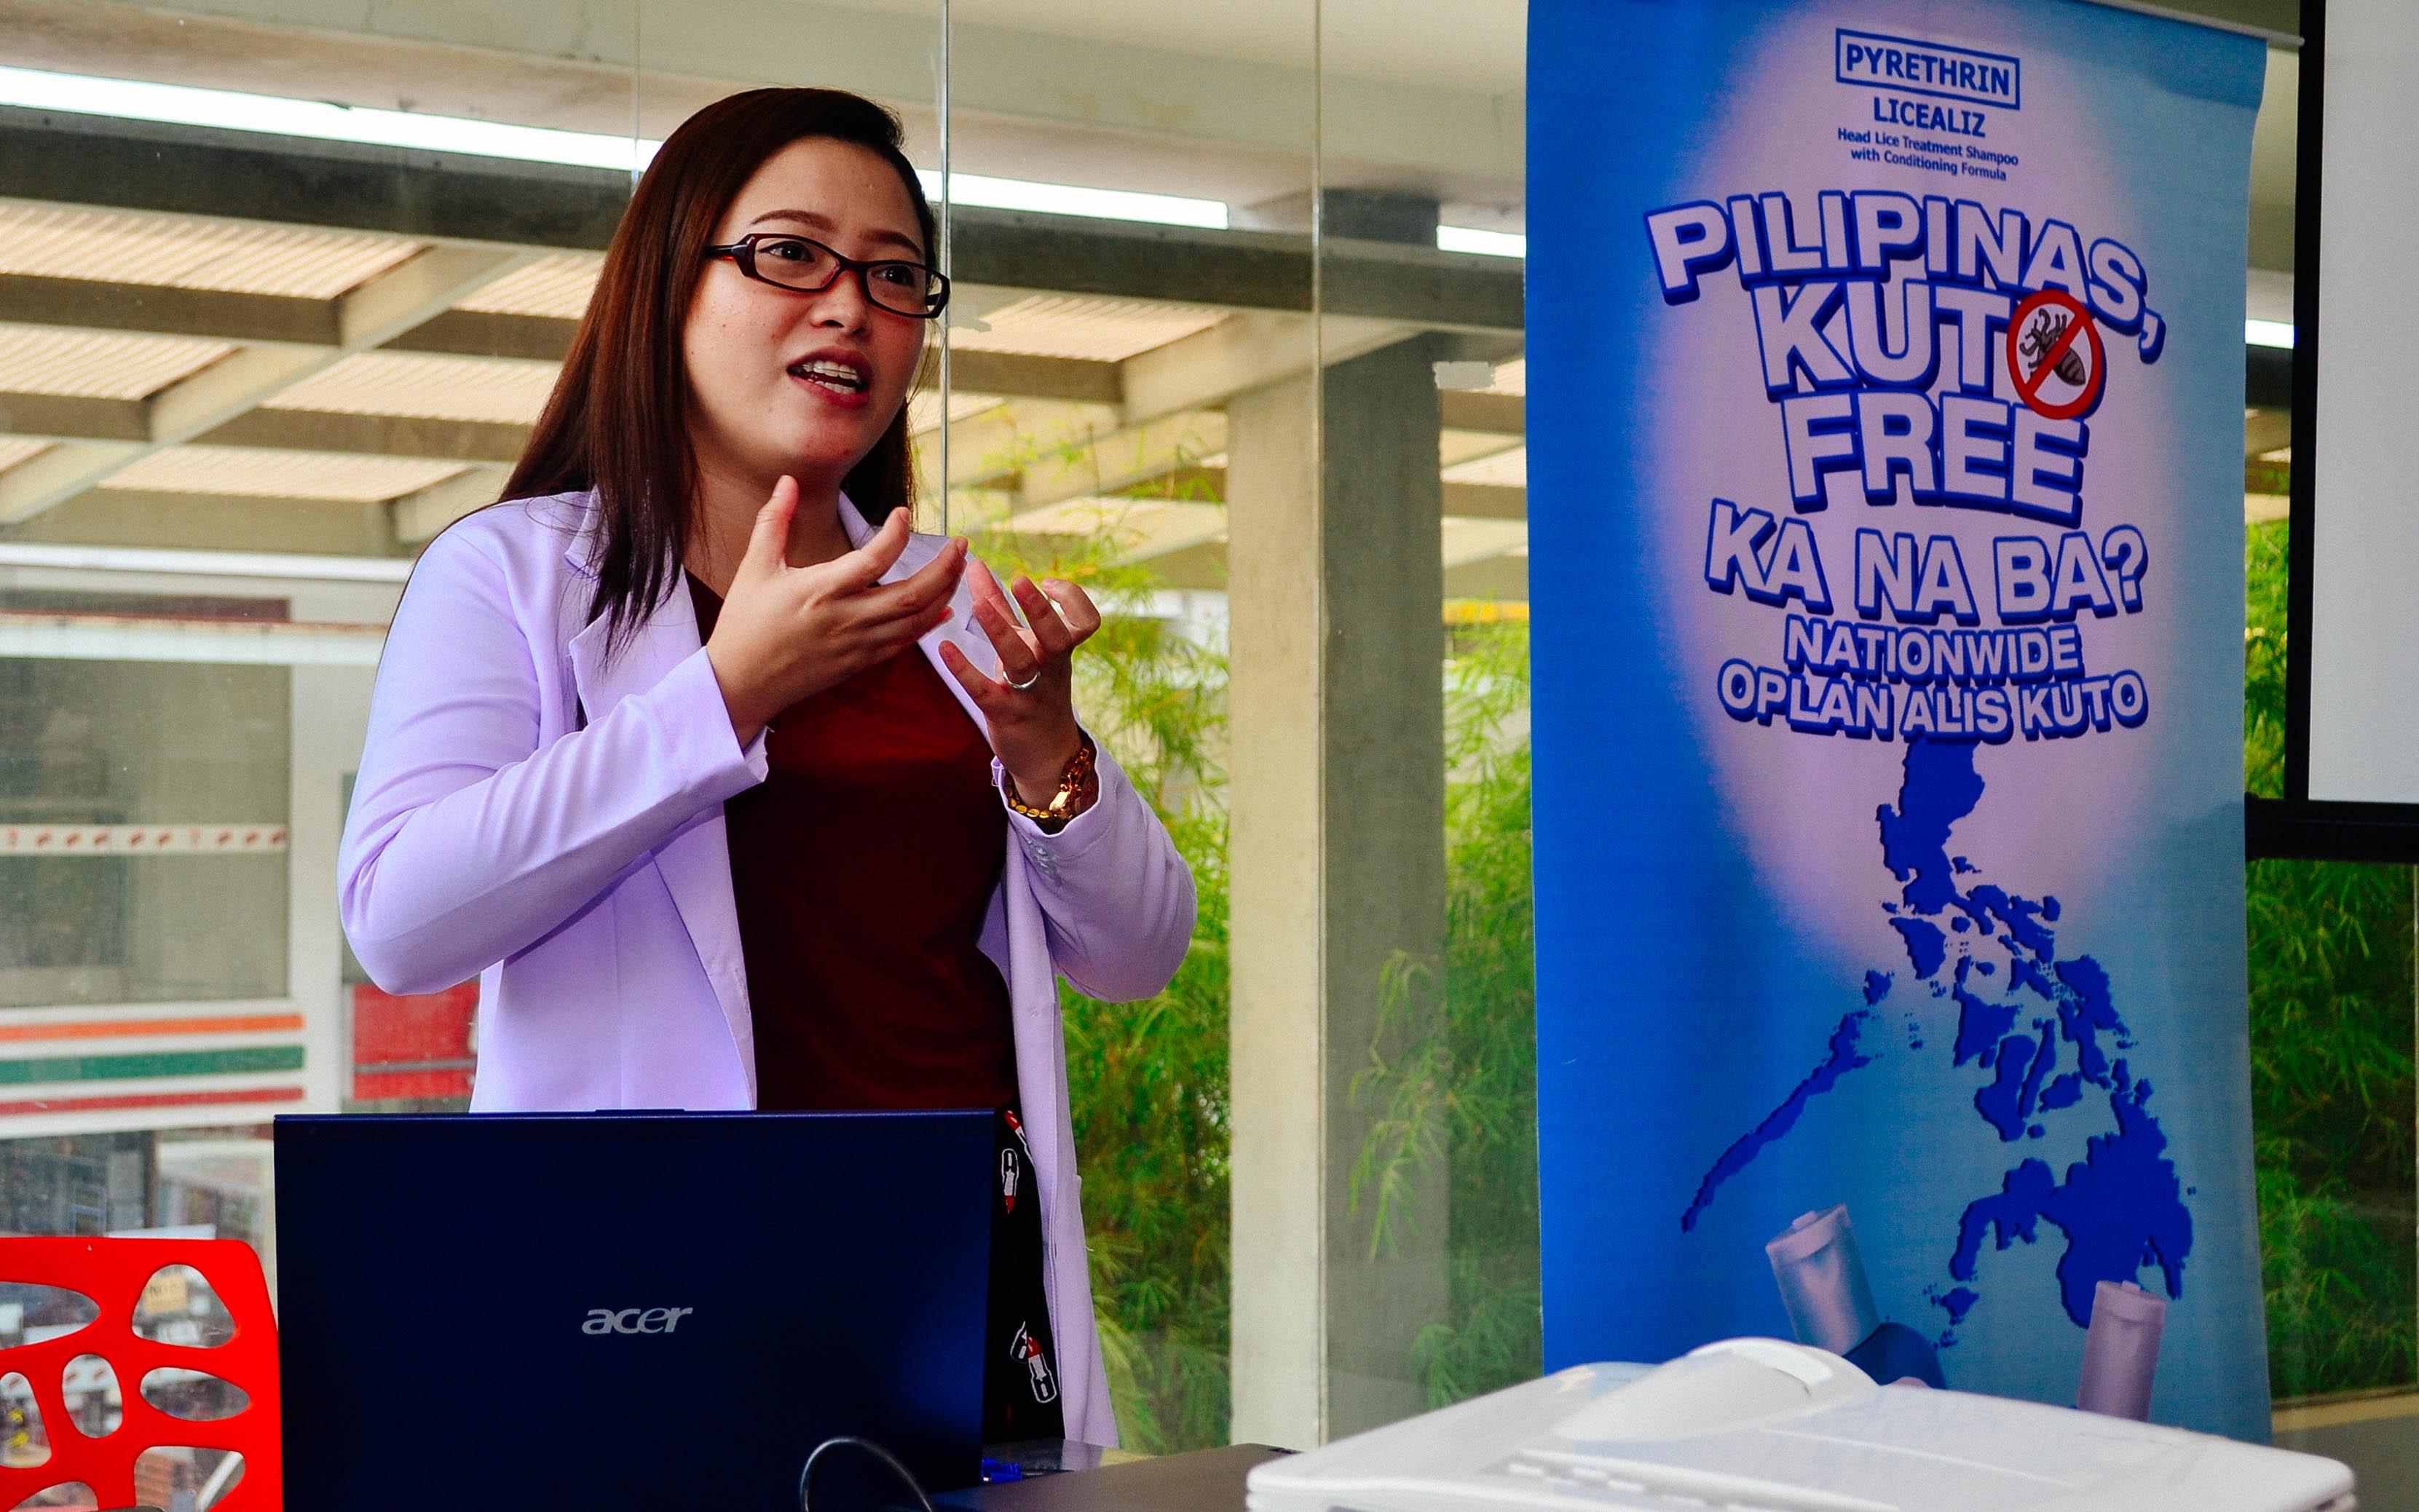 Licealiz Campaign Kilusang Kontra Kuto Lecture